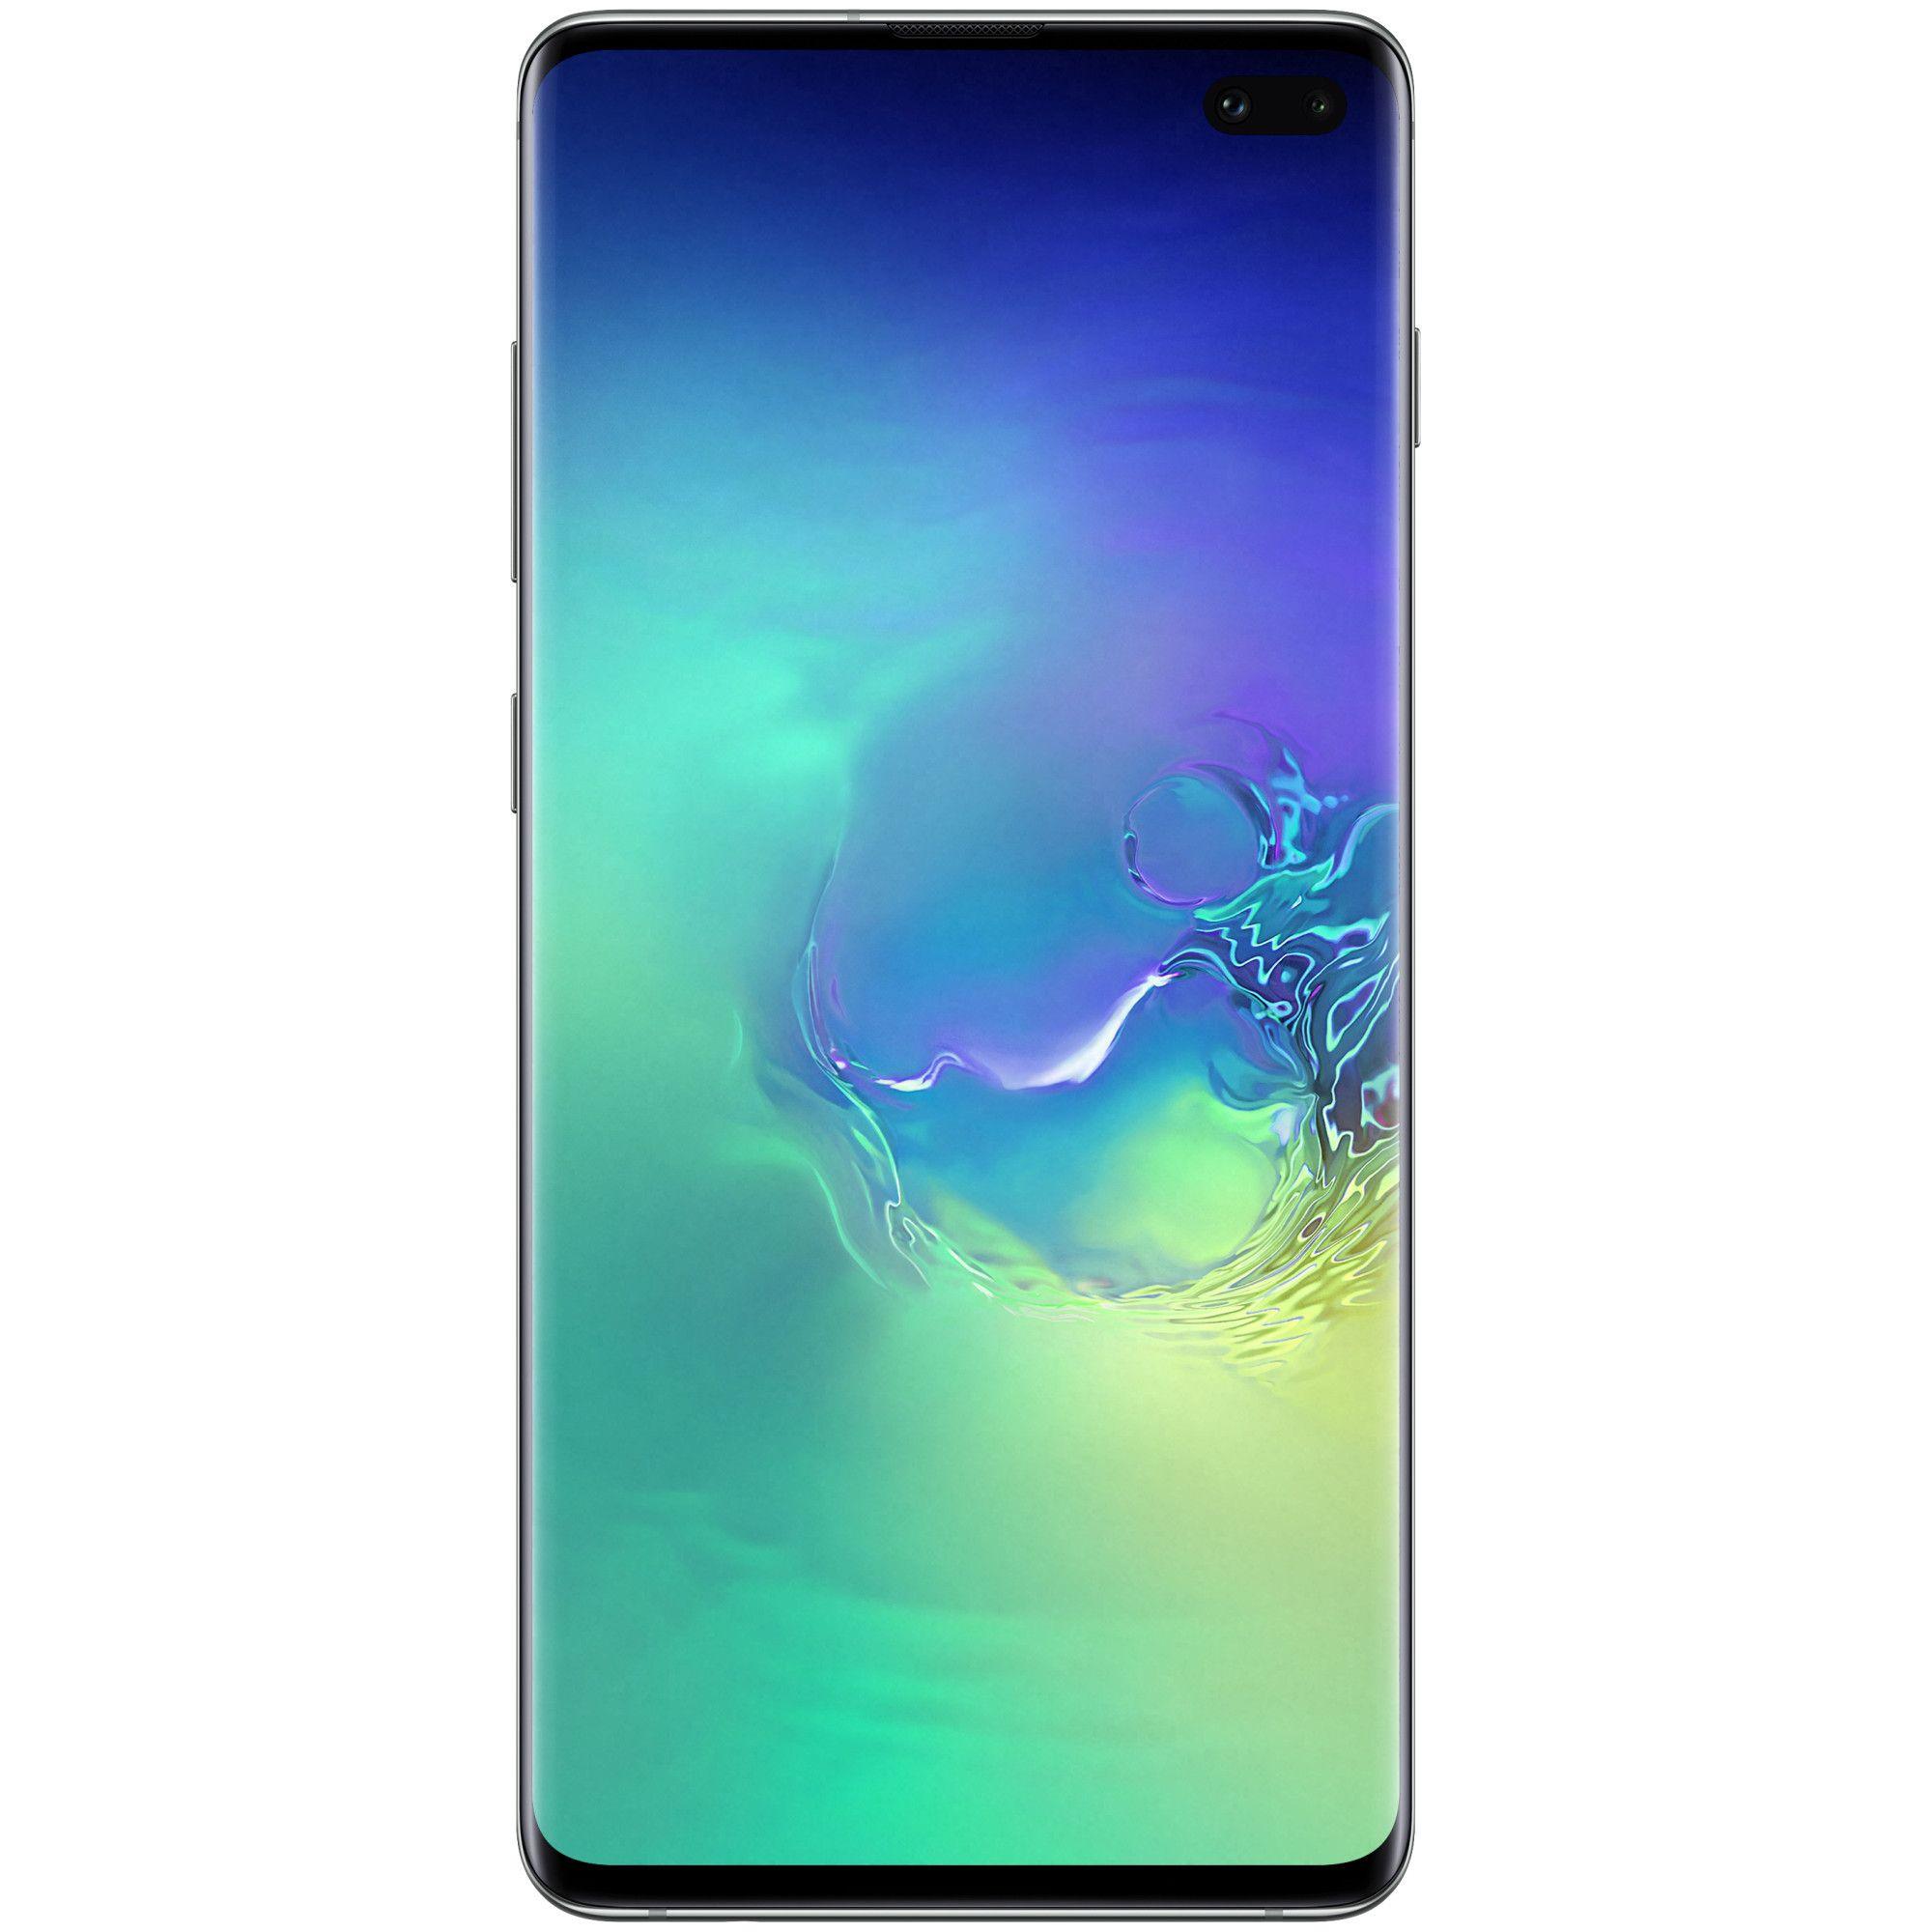 Telefon mobil Samsung Galaxy S10 Plus, G975, Dual SIM, 128GB, 8GB RAM, 4G, Prism Green